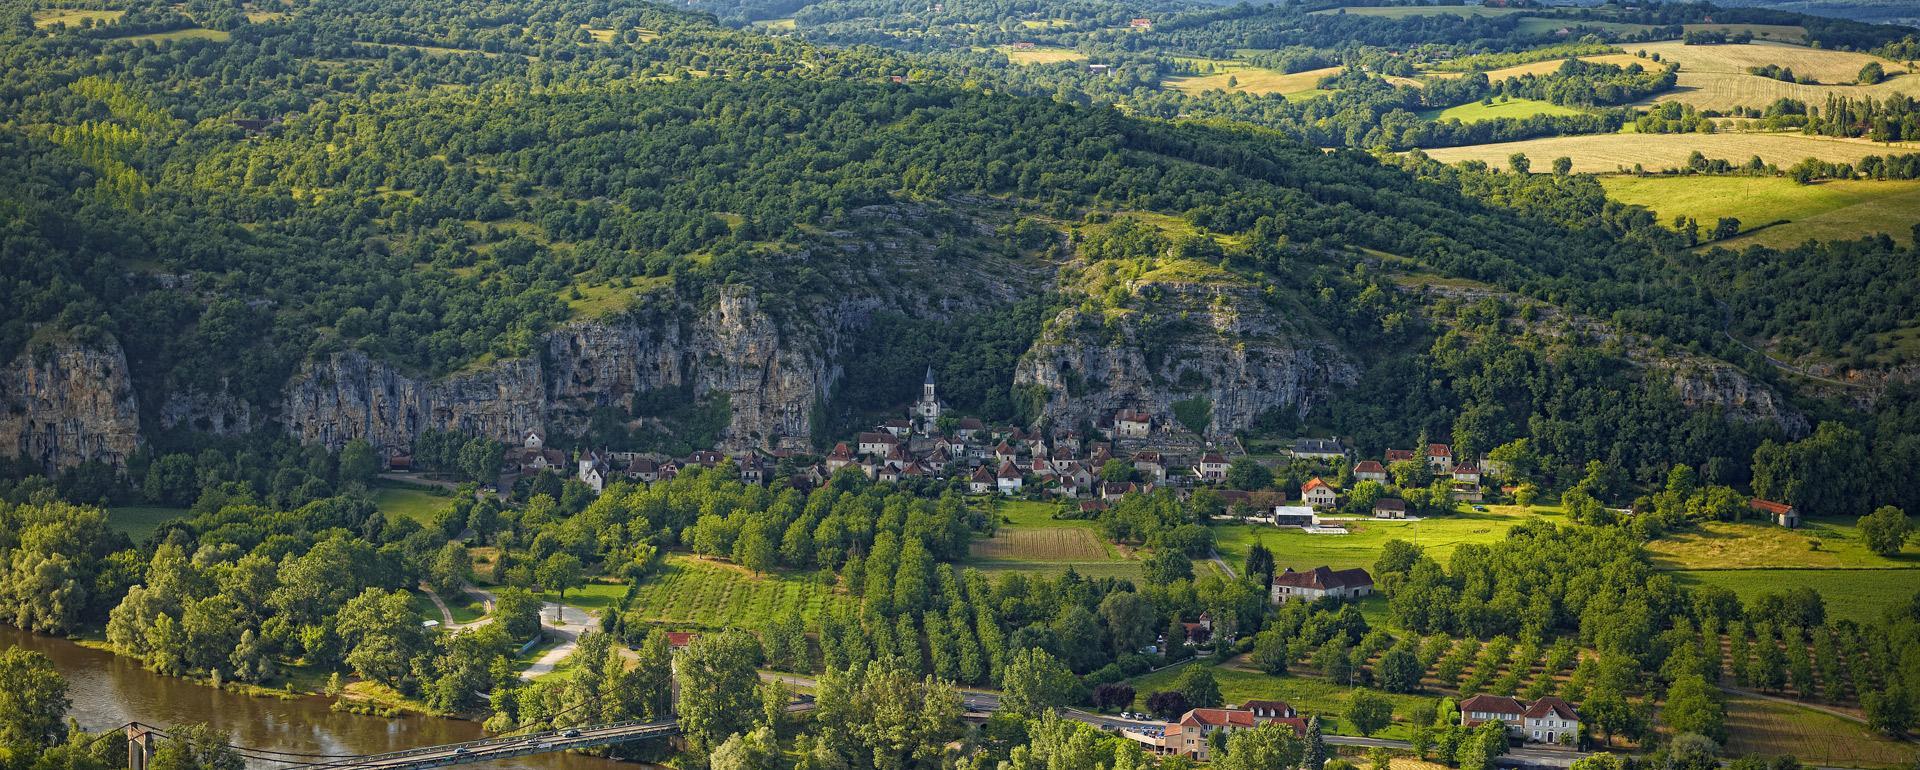 Vallee de la Dorodgne, Gluges